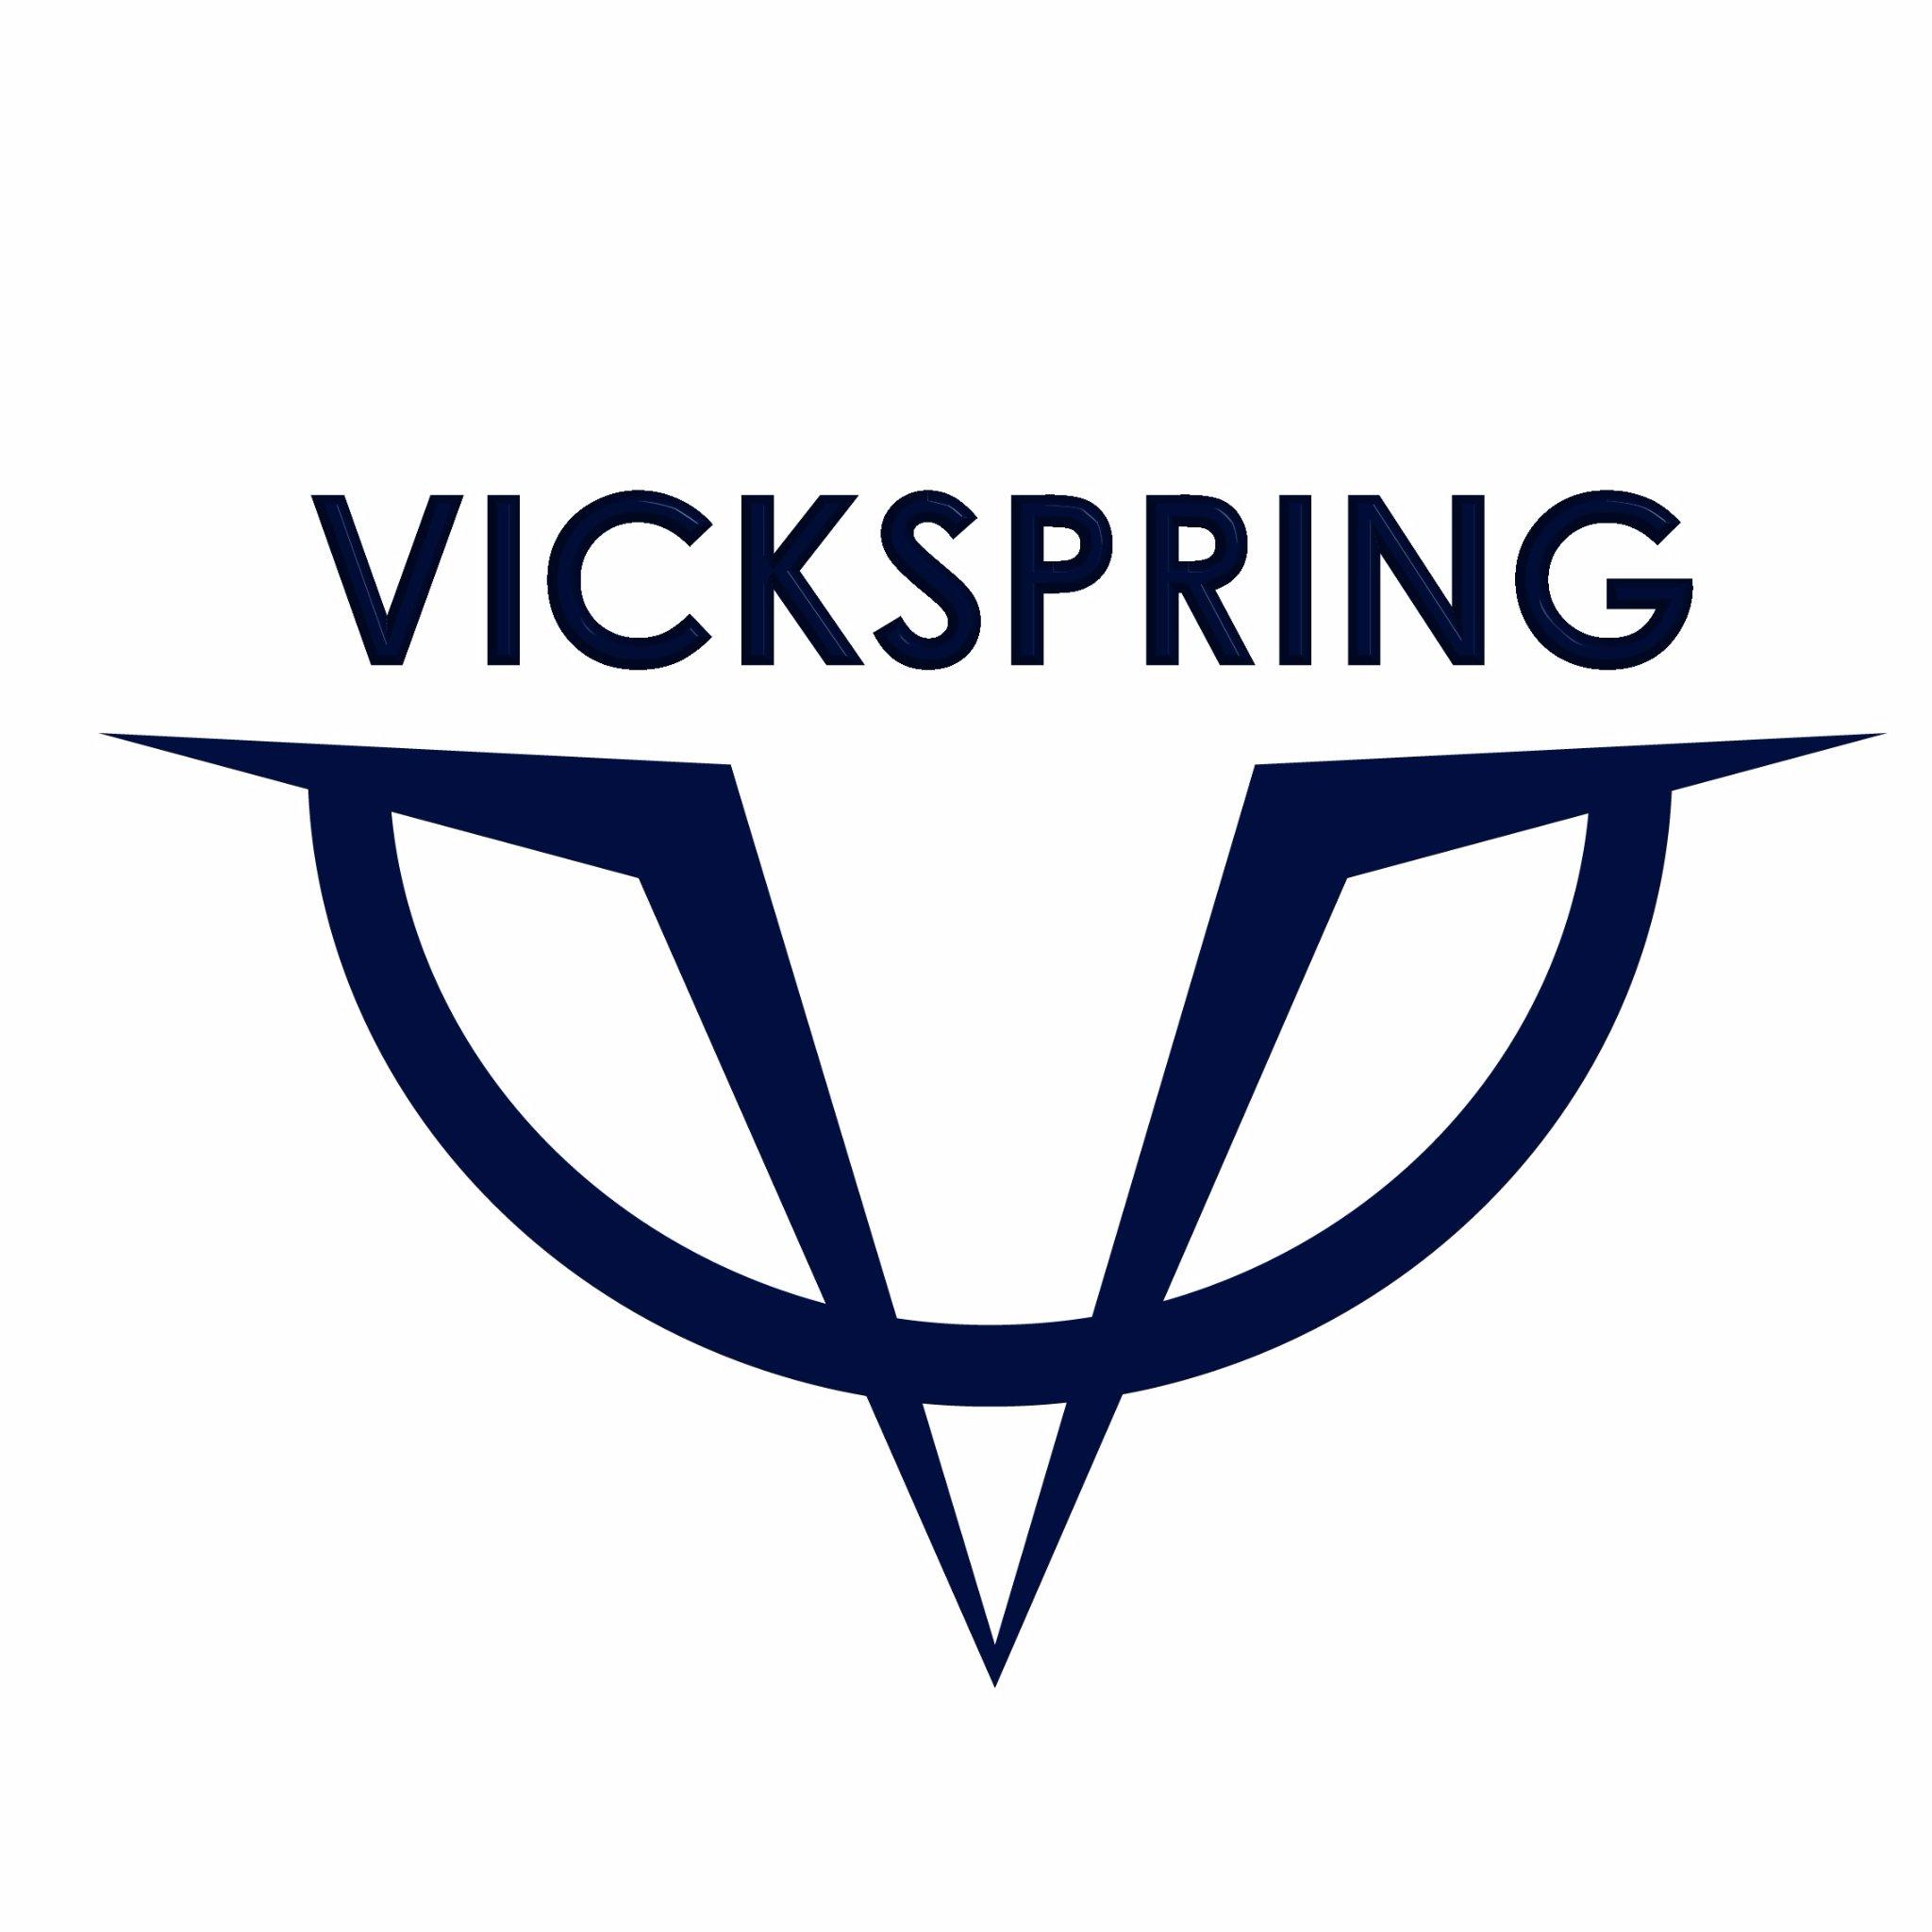 VICKSPRING